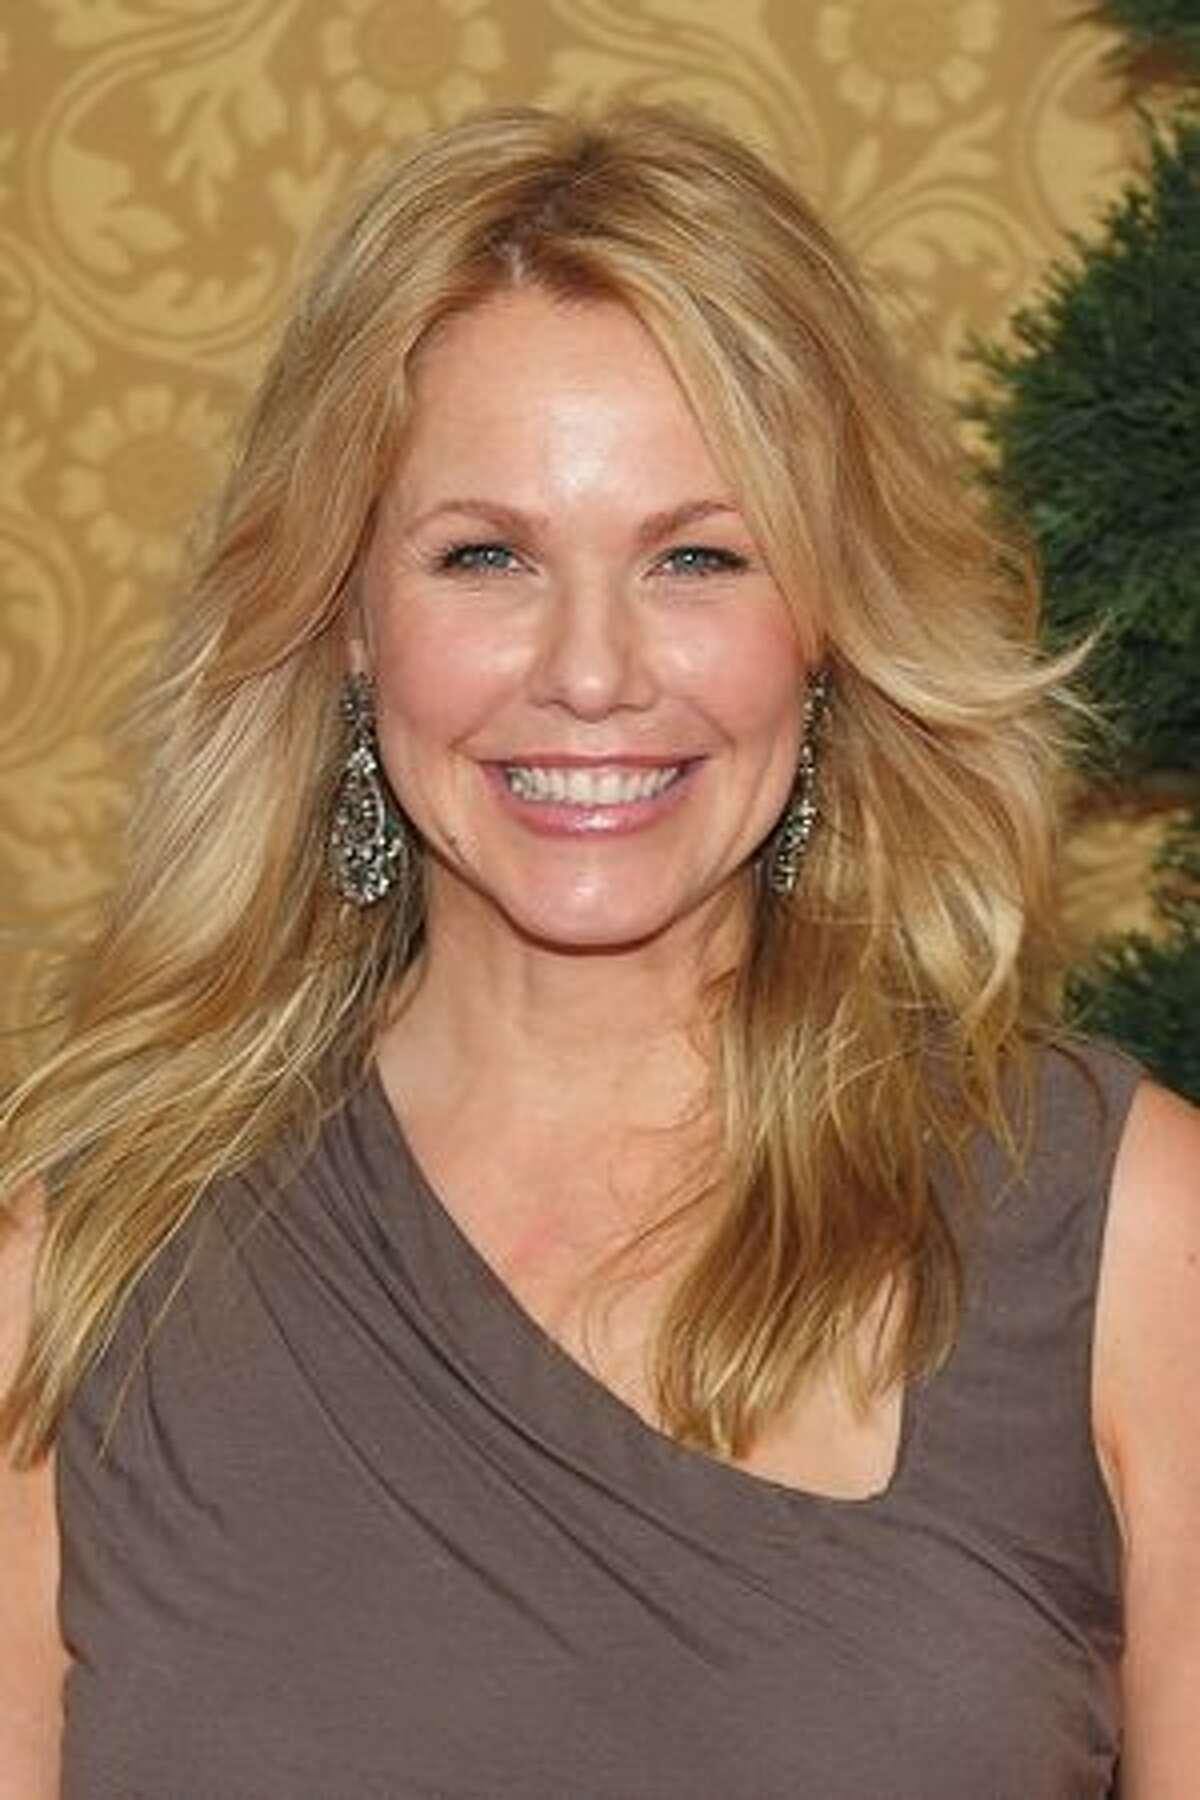 Actress Andrea Roth (